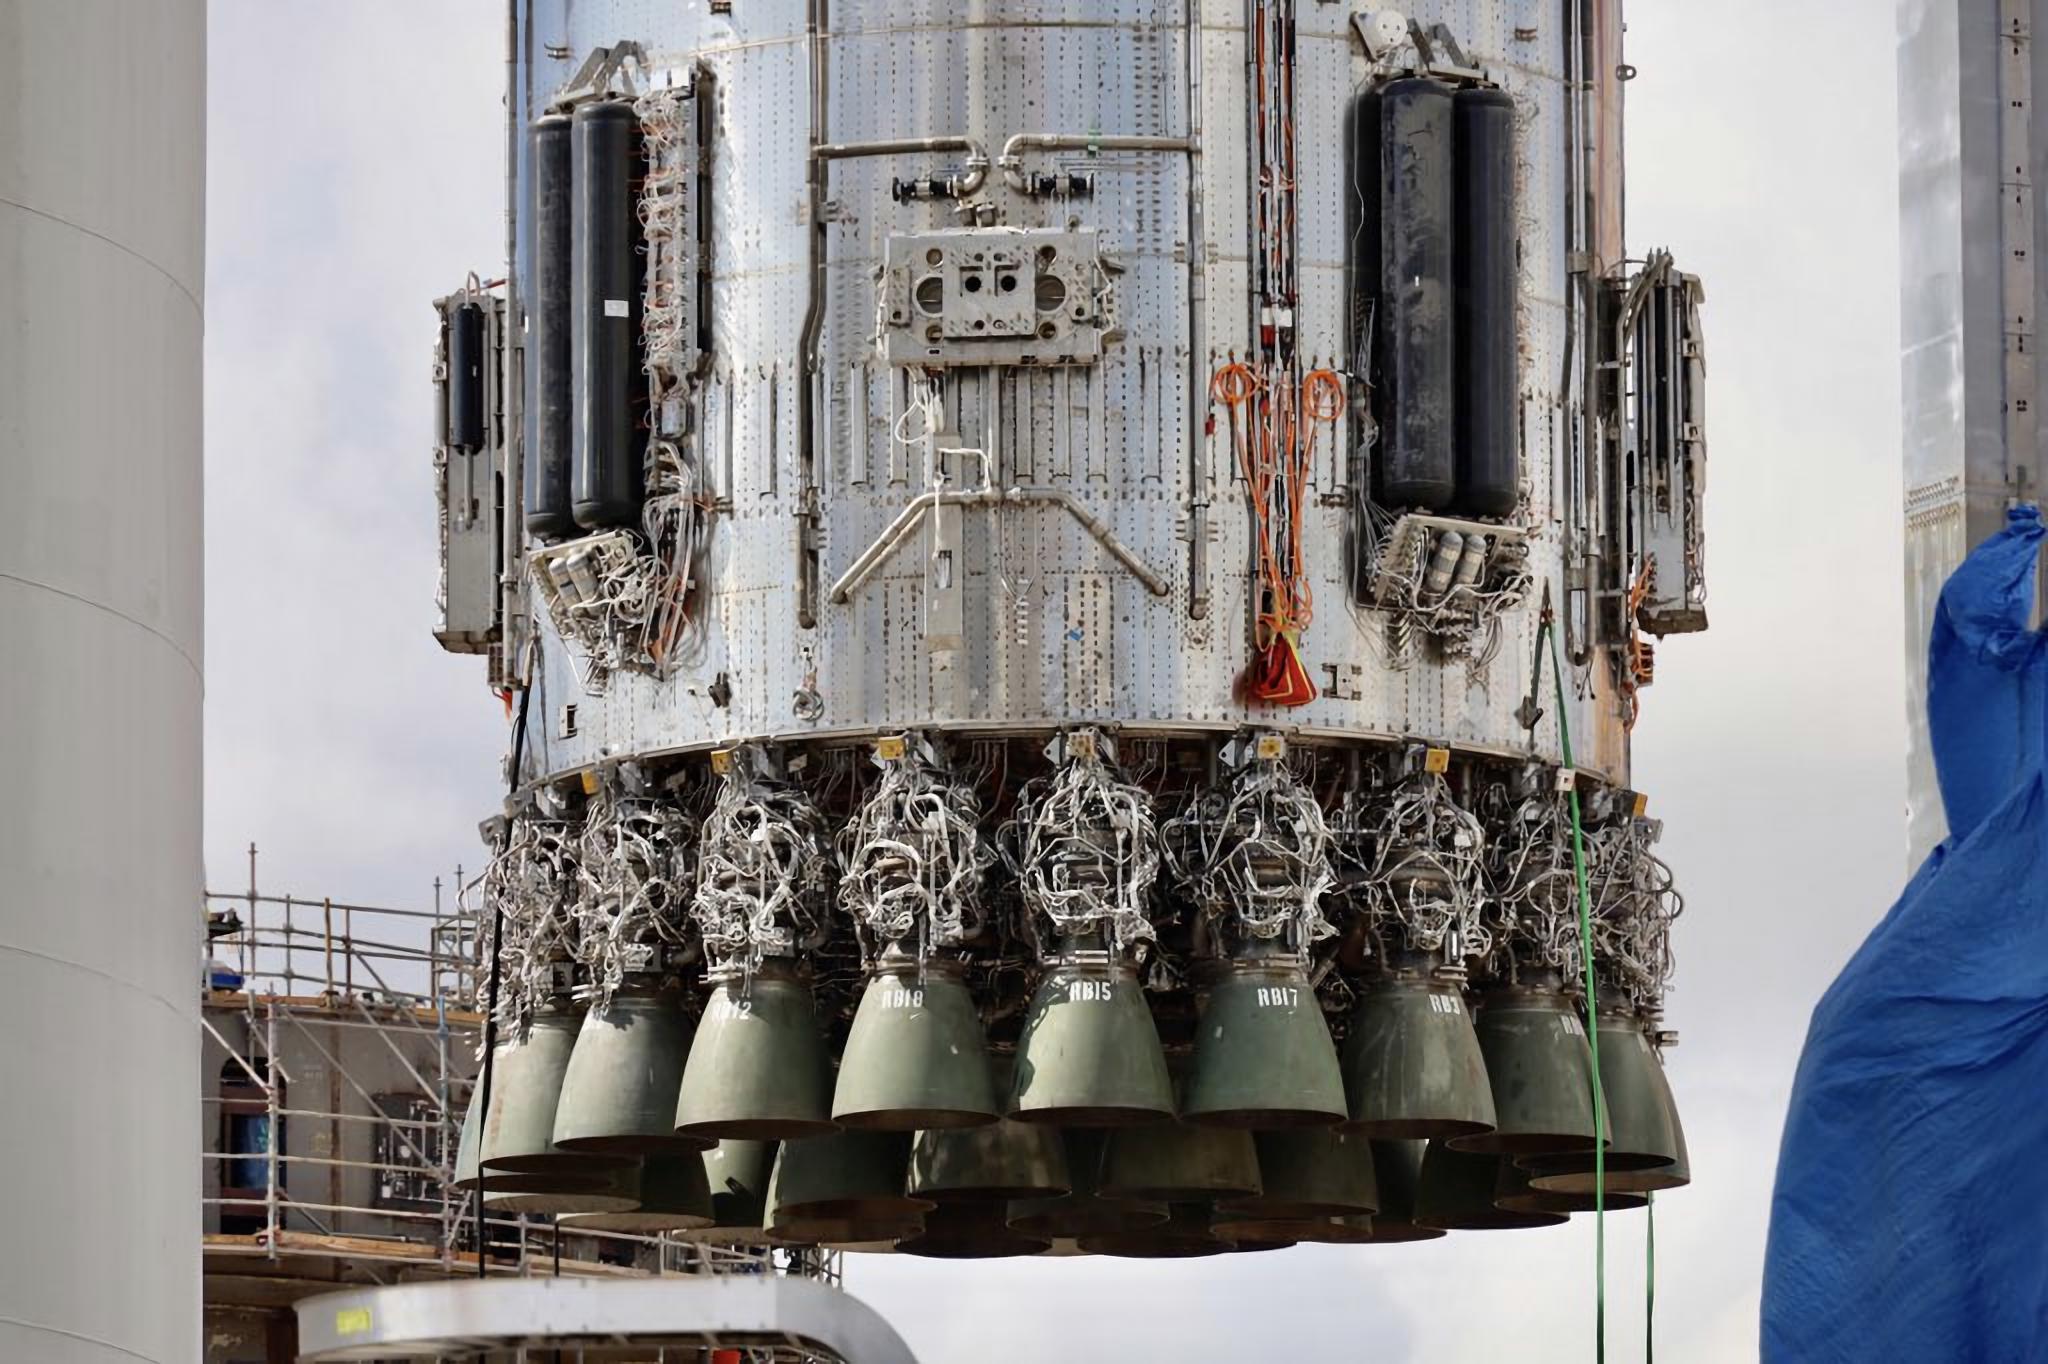 Starbase 090821 (SPadre) B4 orbital launch mount install 1 2X